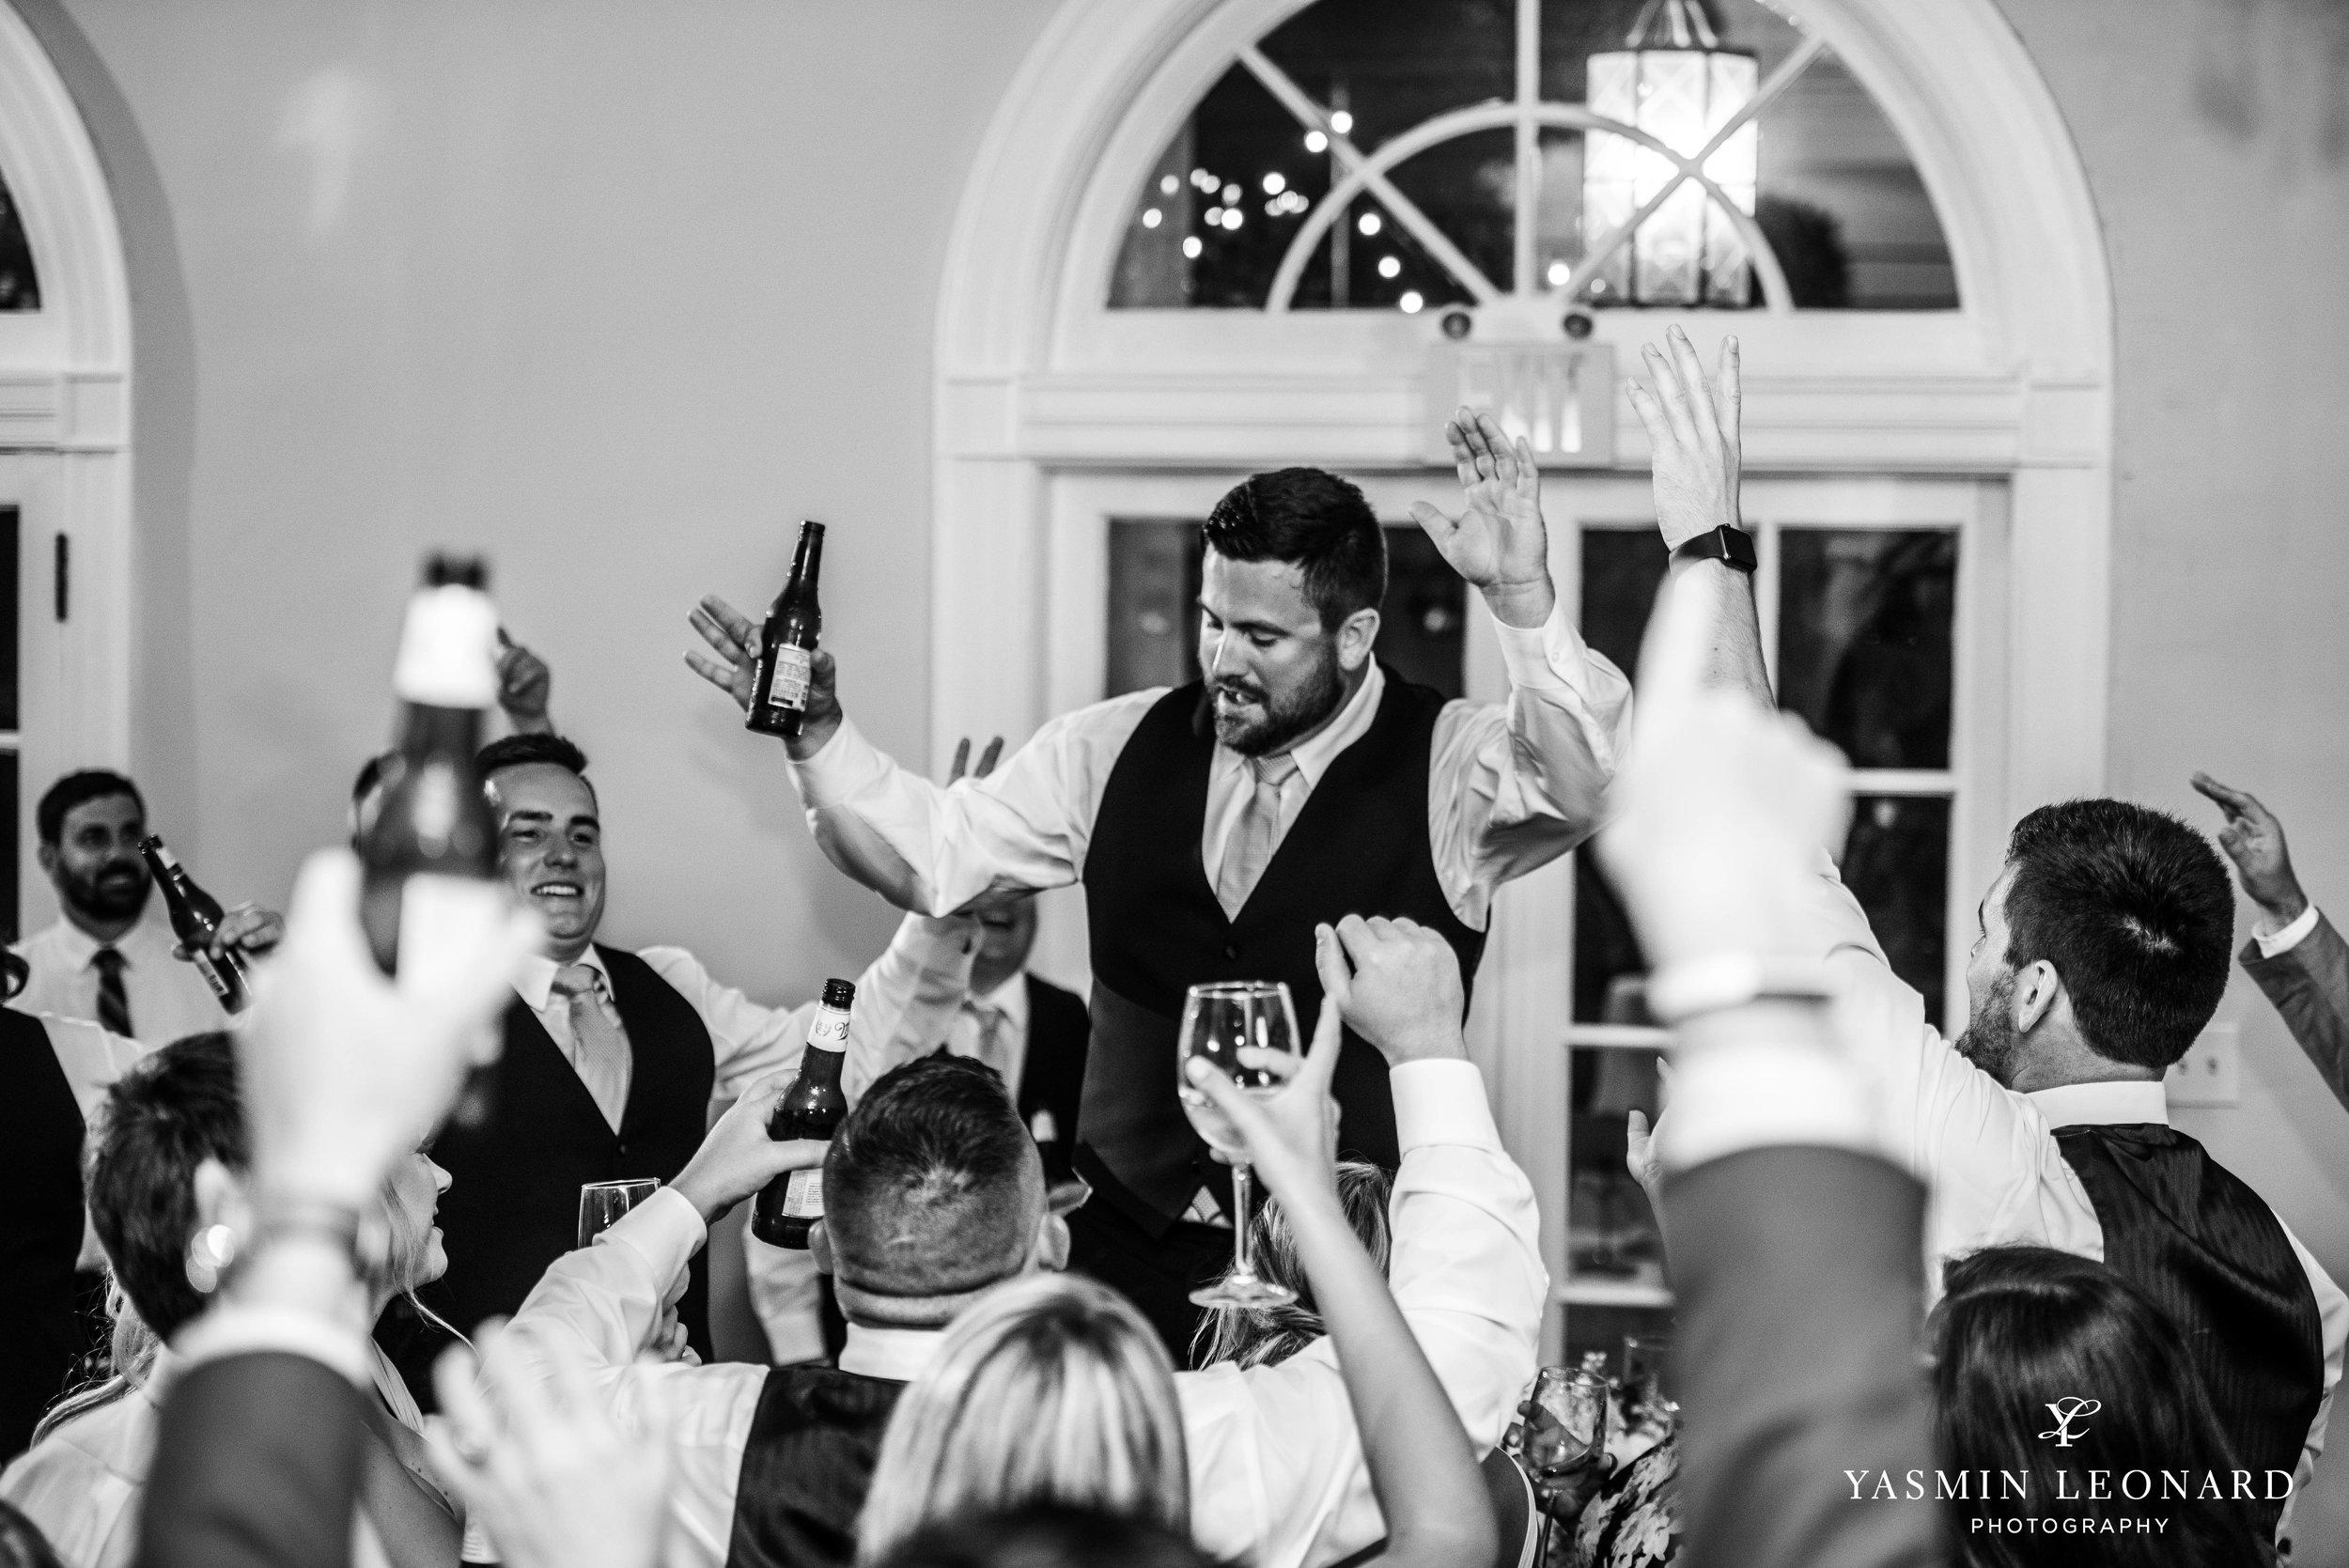 Separk Mansion - NC Weddings - Gastonia Wedding - NC Wedding Venues - Pink and Blue Wedding Ideas - Pink Bridesmaid Dresses - Yasmin Leonard Photography-62.jpg